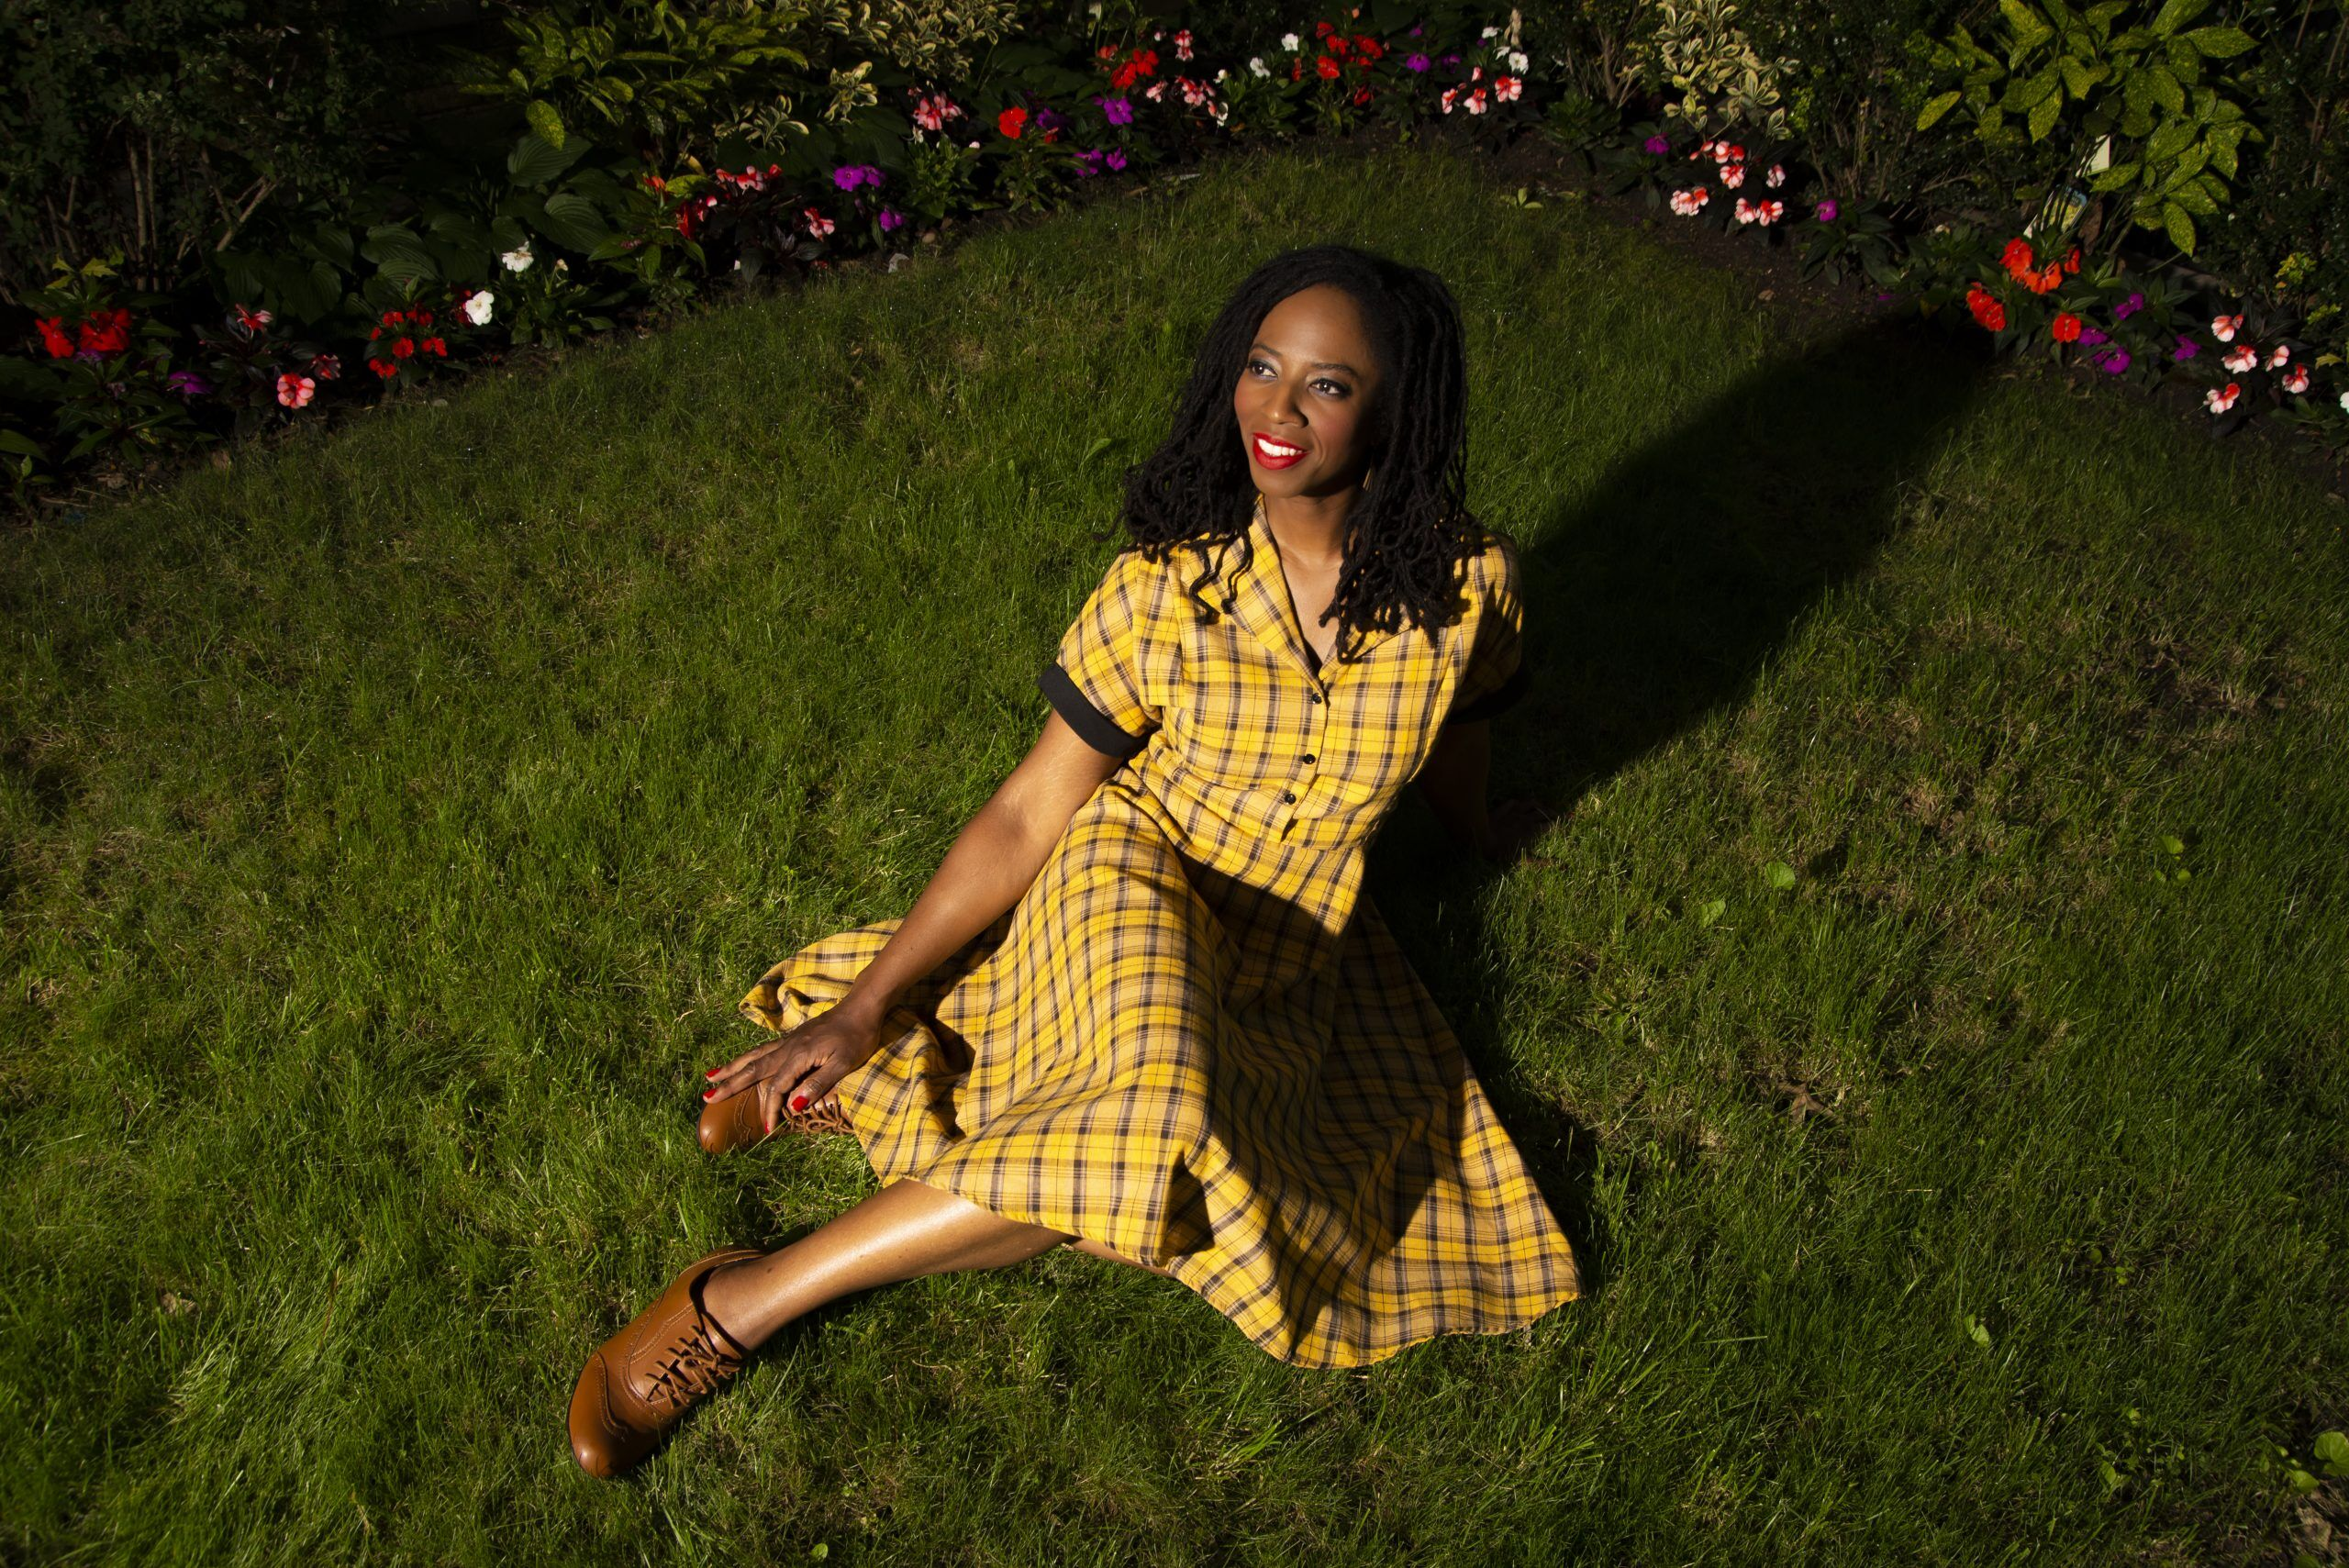 Risa Branch In Grass- Photo by Aidan Grant_Horizontal